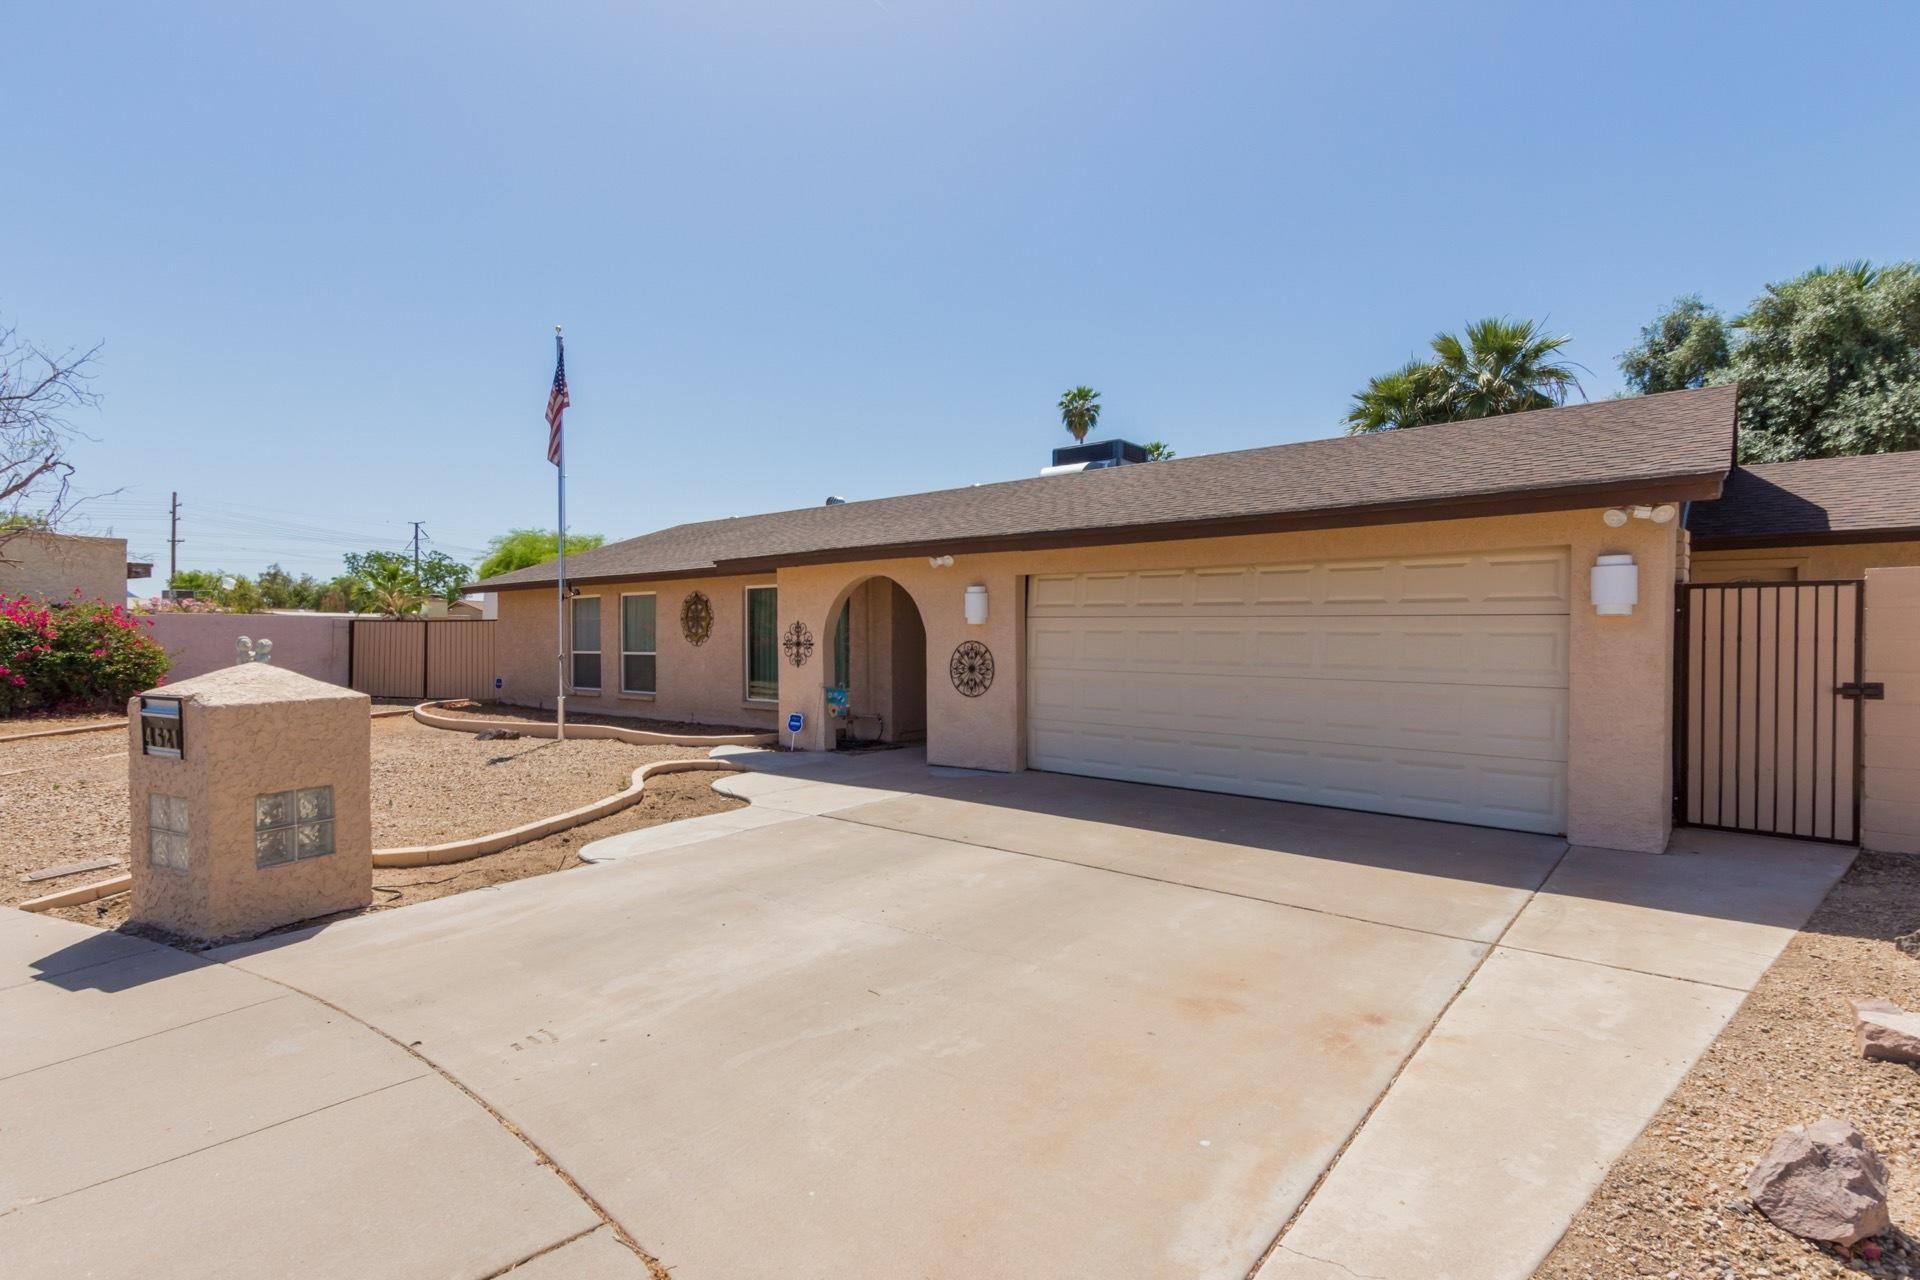 Photo of 4621 W DESERT COVE Avenue, Glendale, AZ 85304 (MLS # 6232199)